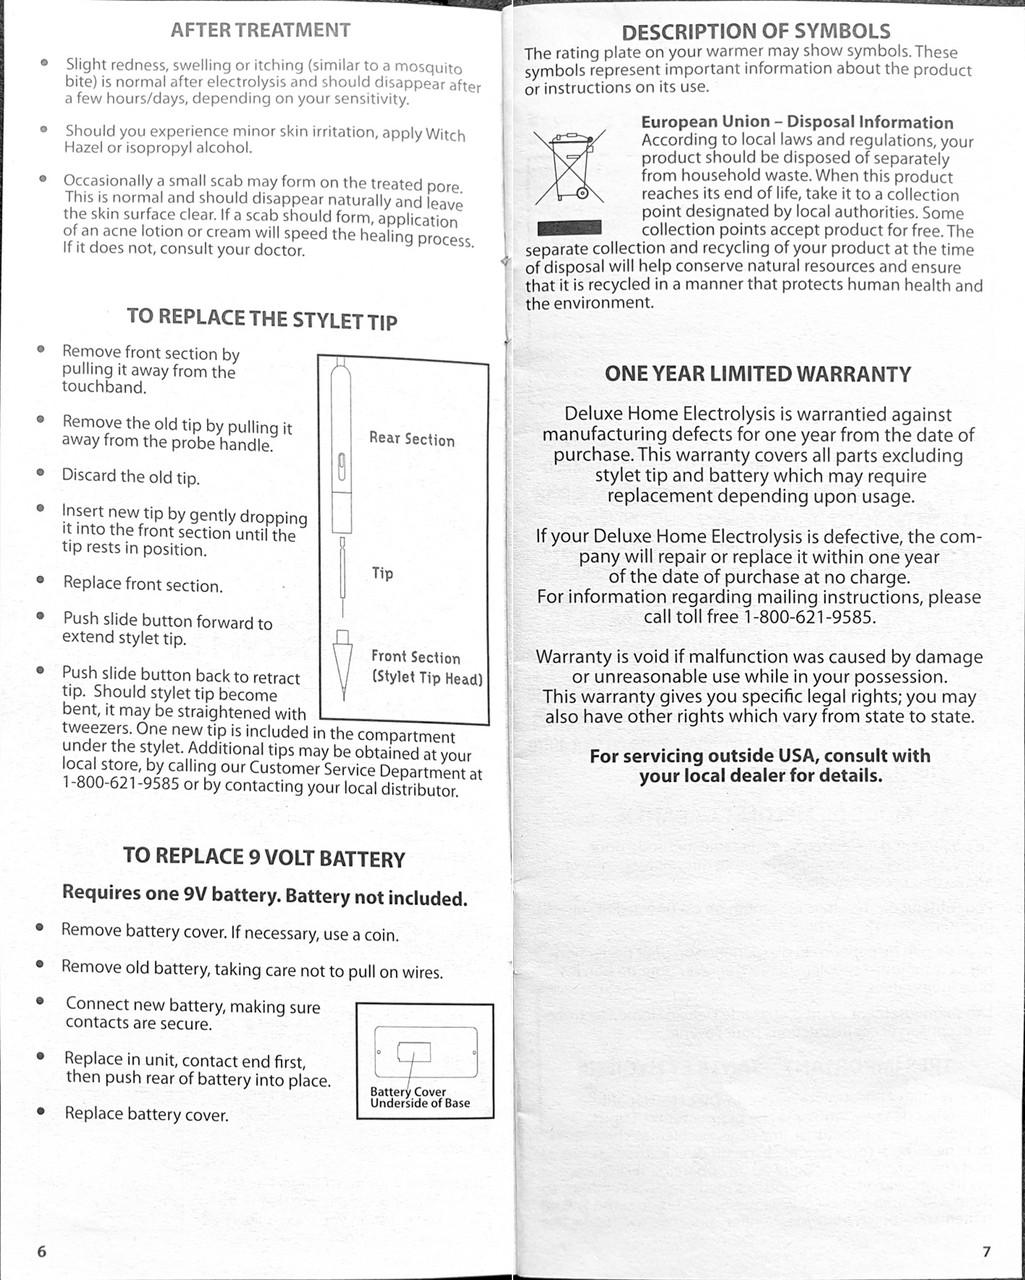 Clean & Easy Deluxe Home Electrolysis Kit